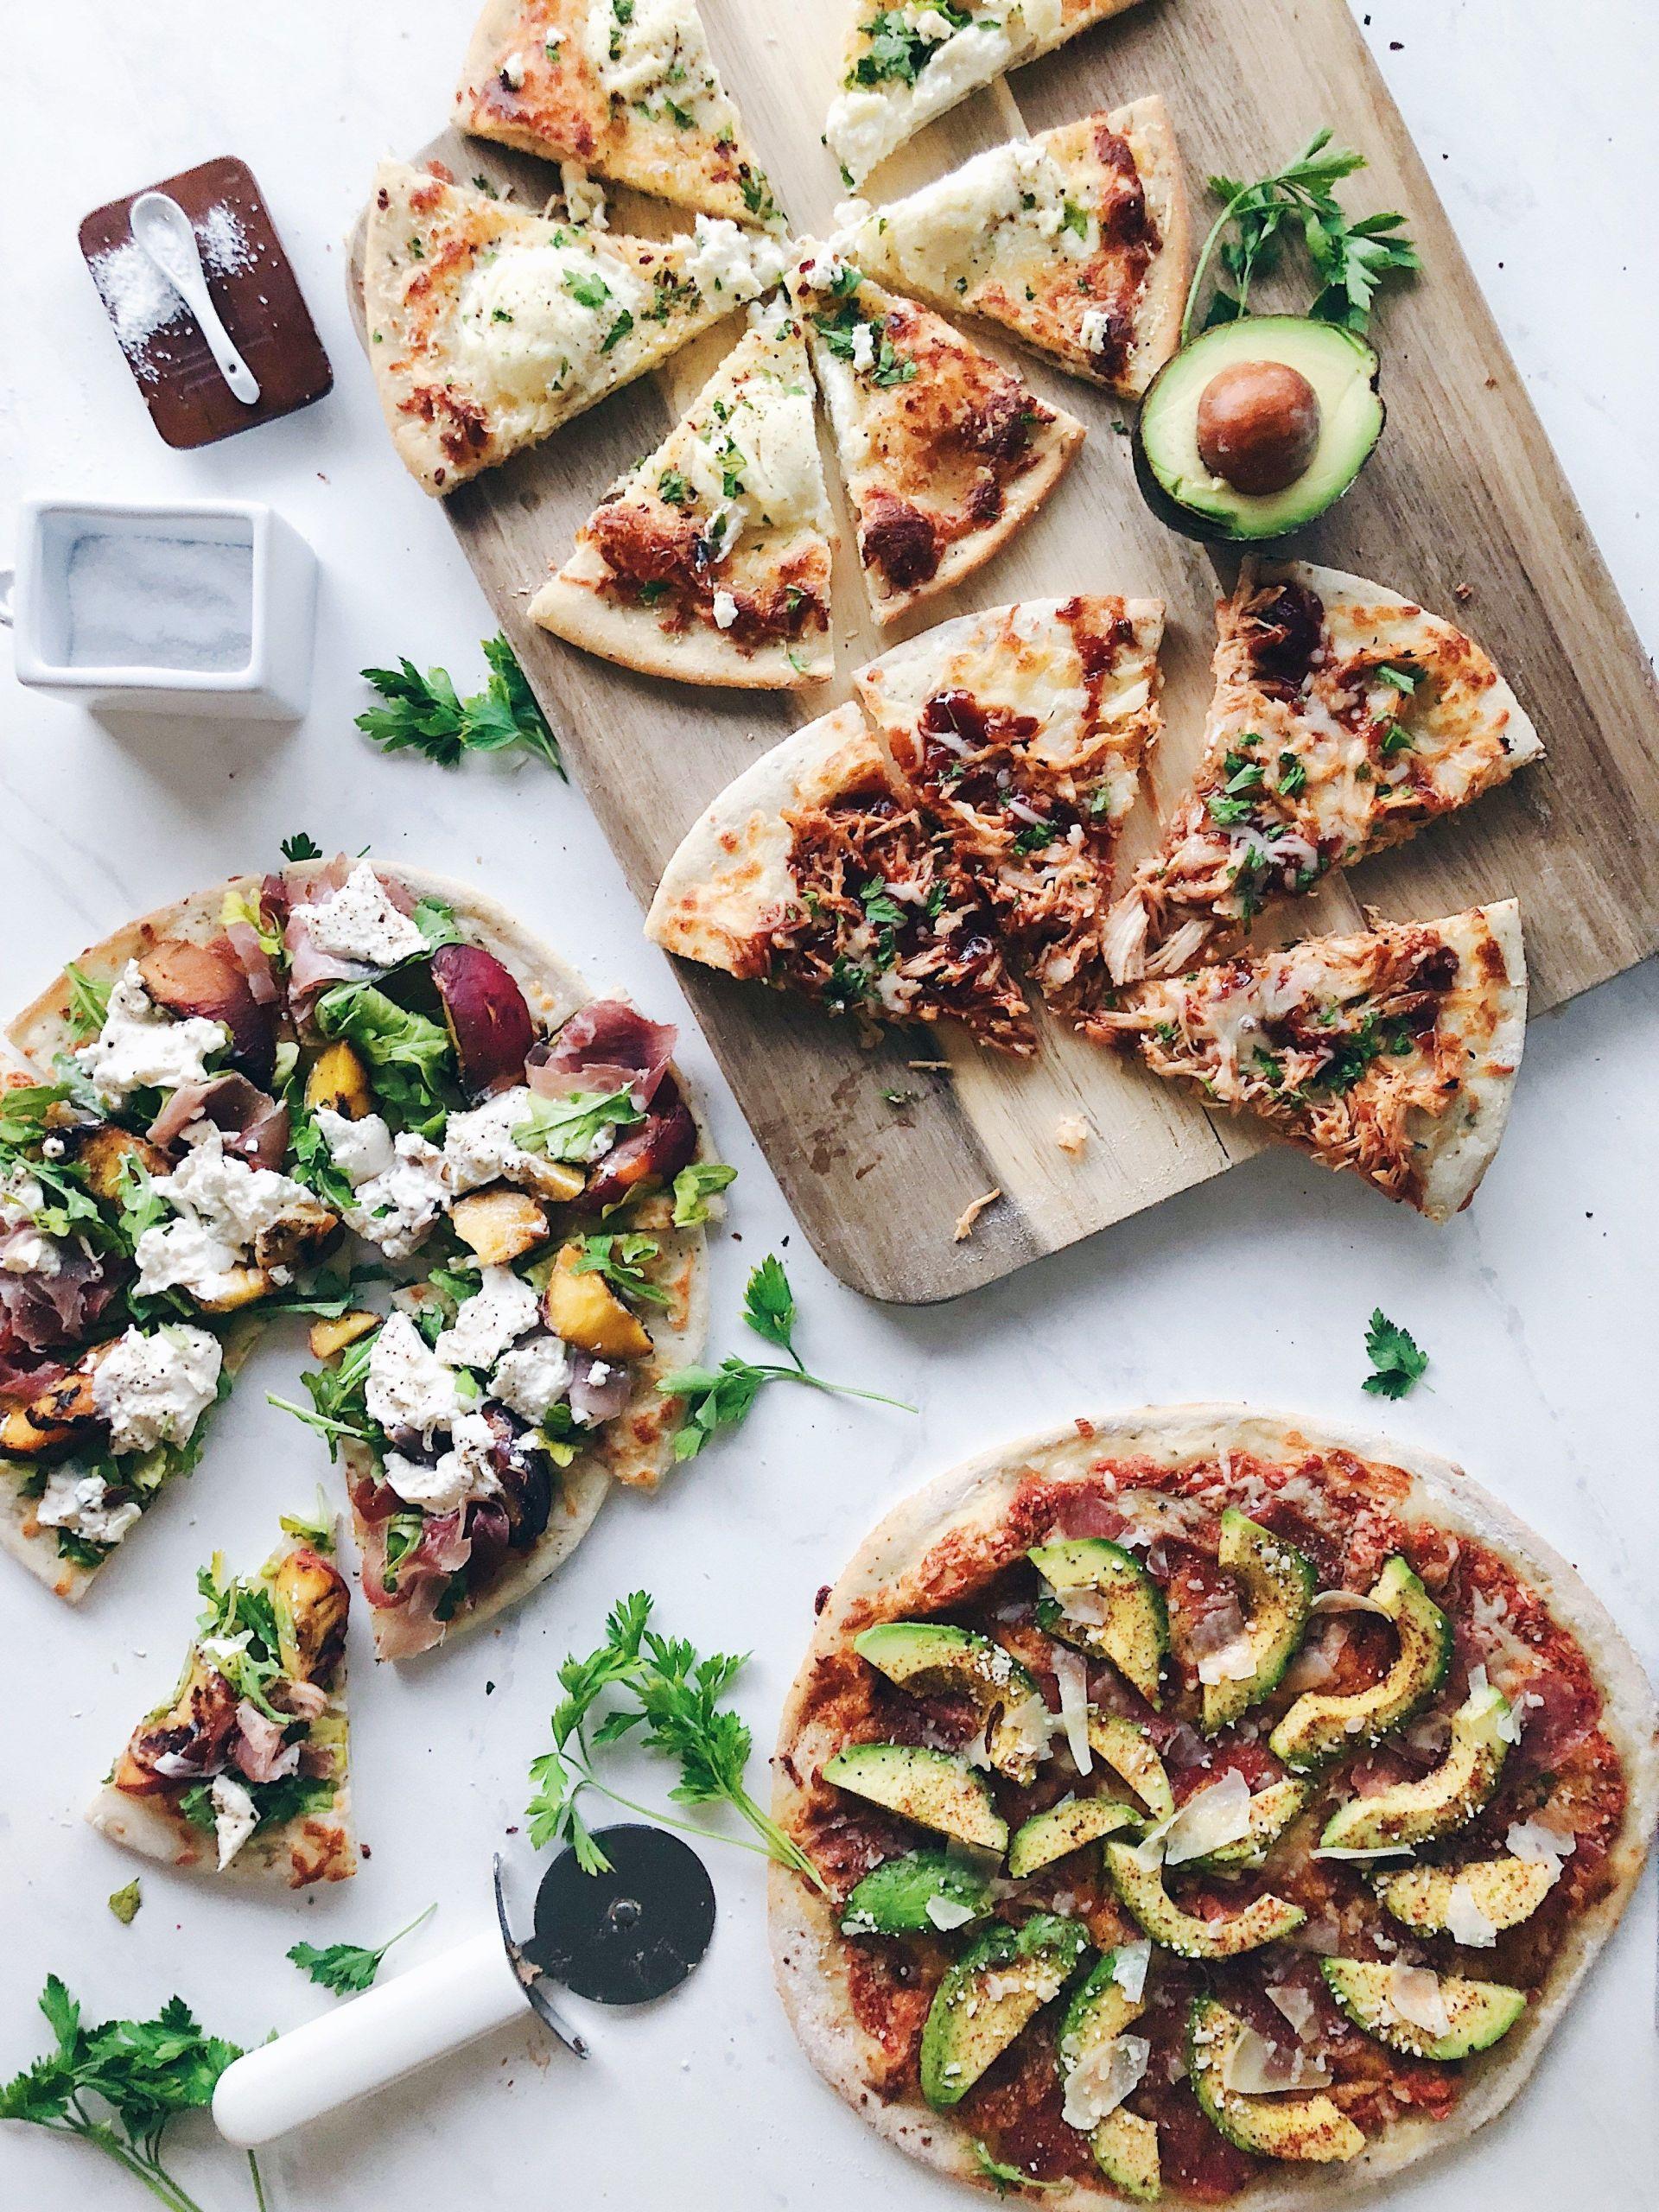 Gourmet Pizza Dough Recipe  Unfed Sourdough Starter Pizza Crust – The Buttery Whisk